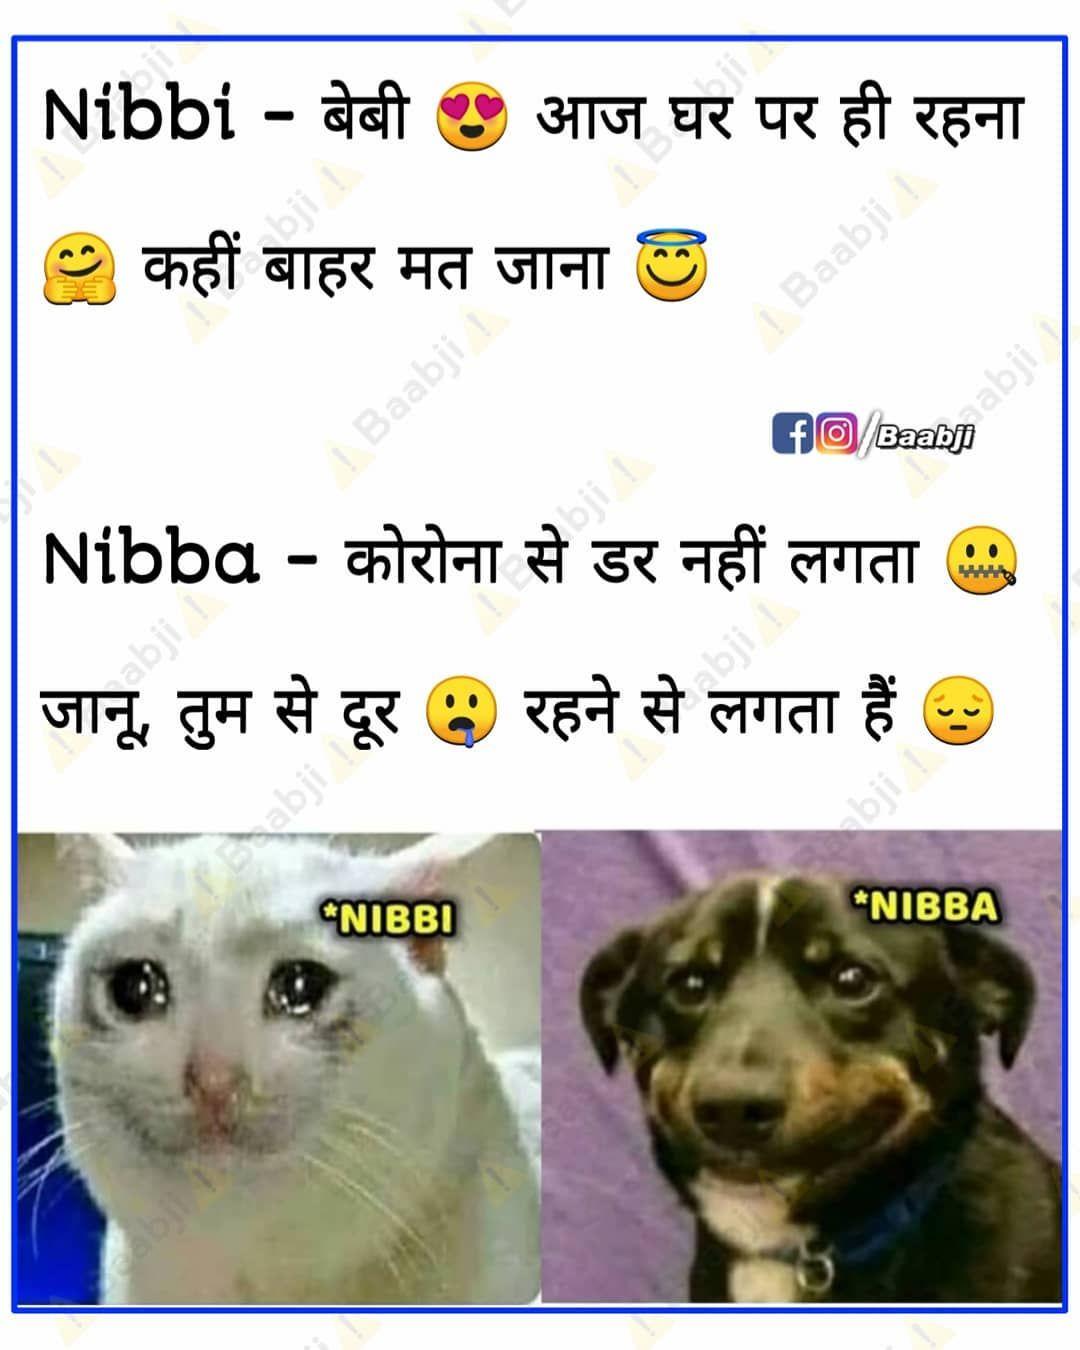 Nibba Nibbi Desimeme Desifun Indianjokes Hindimemes Hindijoke Viralmeme Latestmeme Indianmemestore Jokesinhindi Jokes In Hindi Indian Jokes Memes